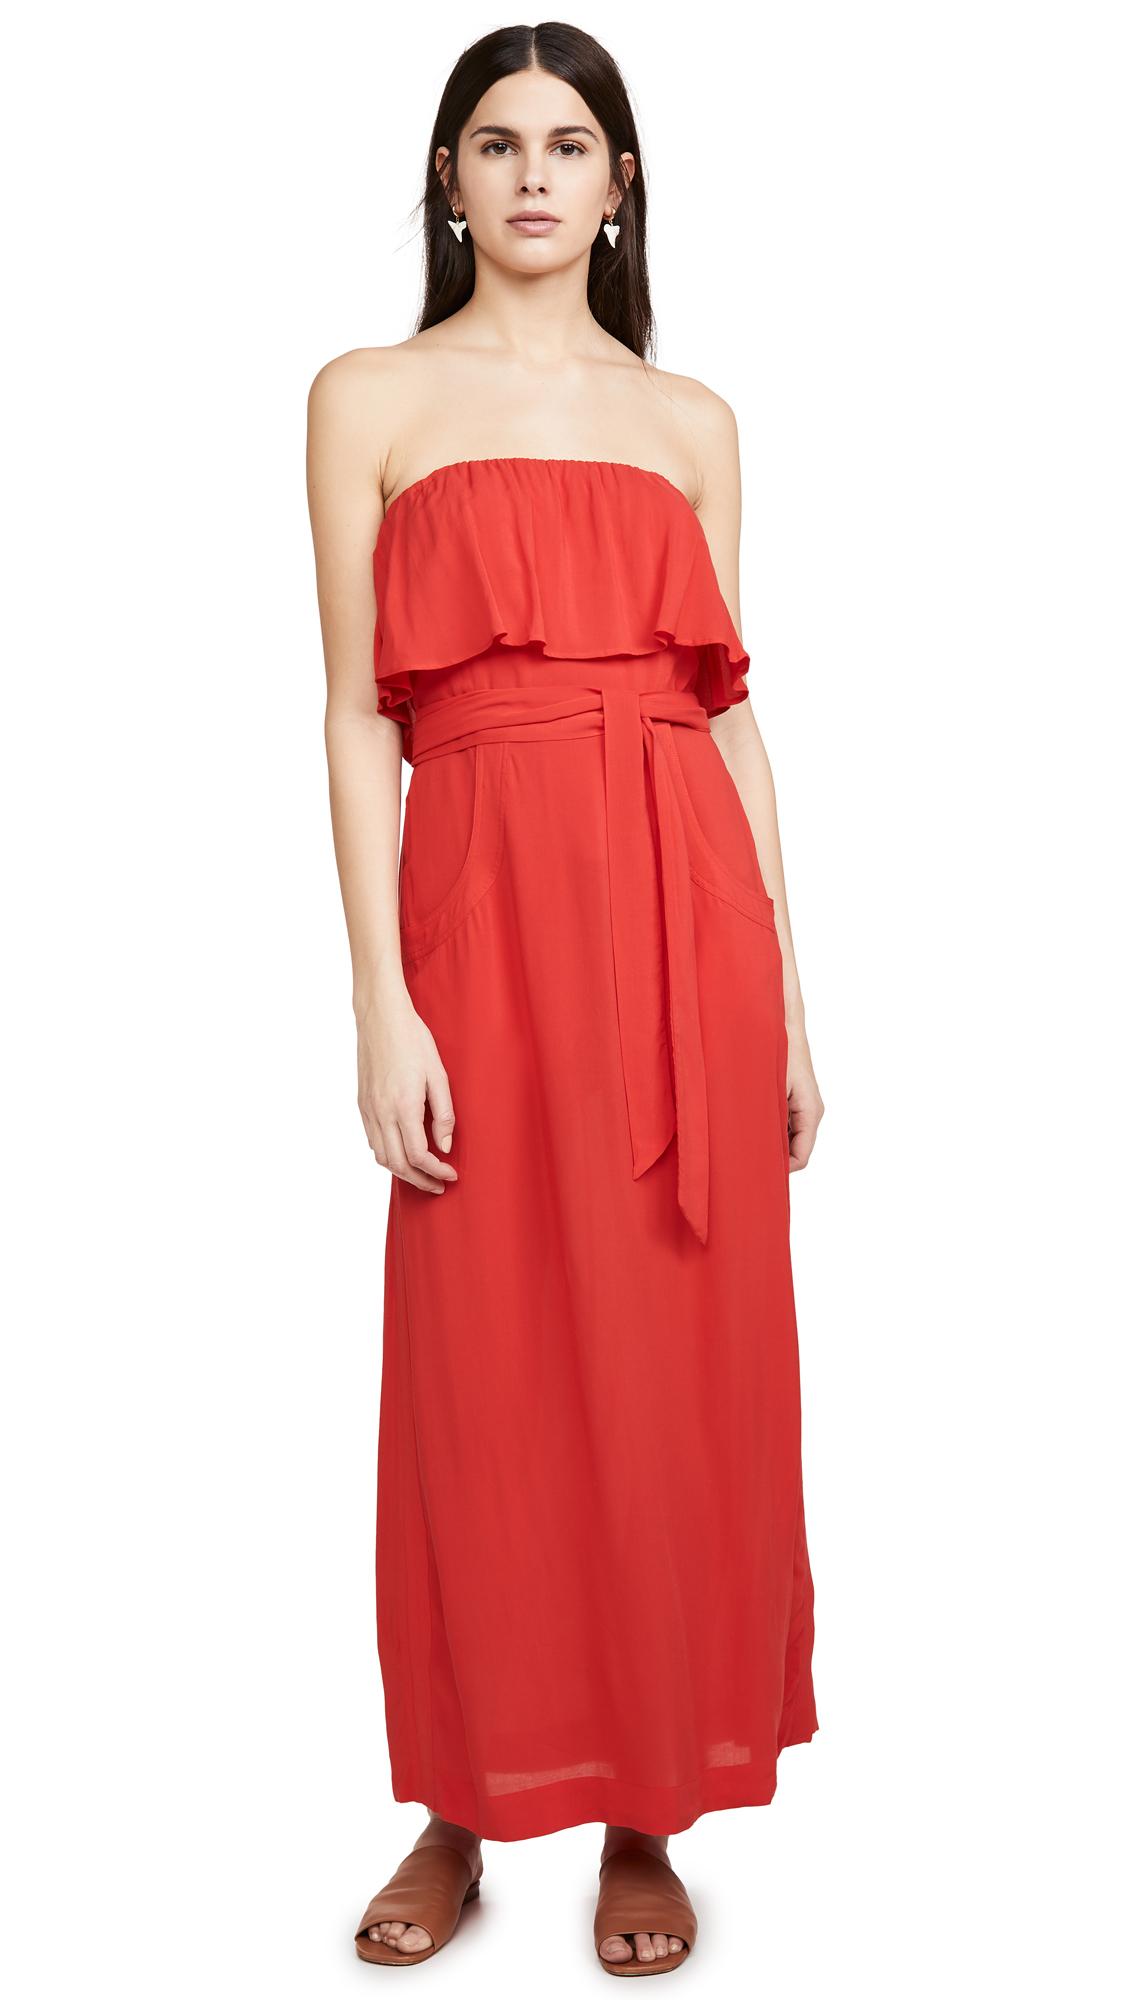 ViX Swimwear Glenda Dress